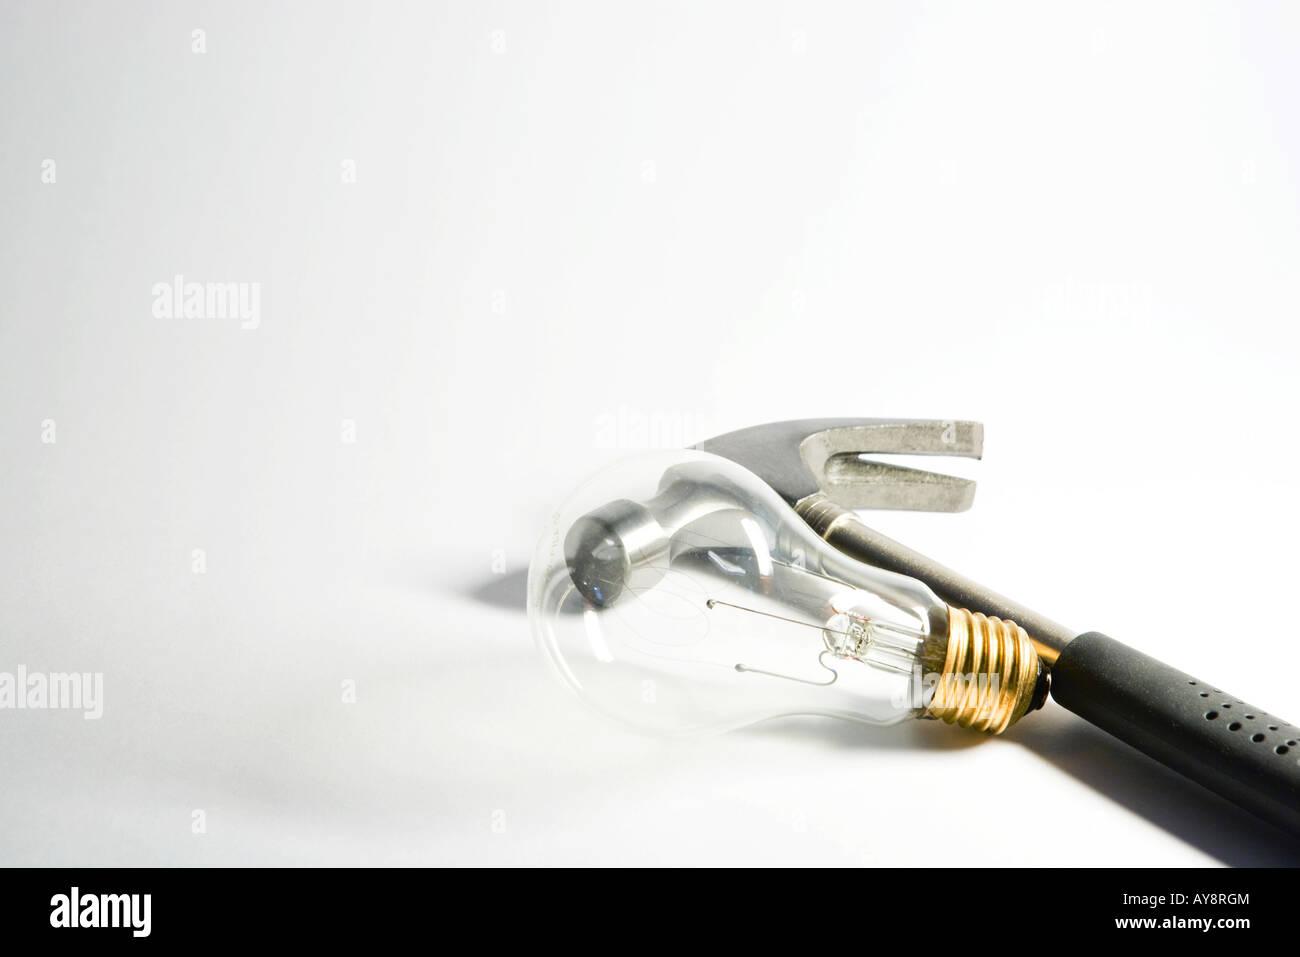 Hammer resting beside light bulb, close-up - Stock Image